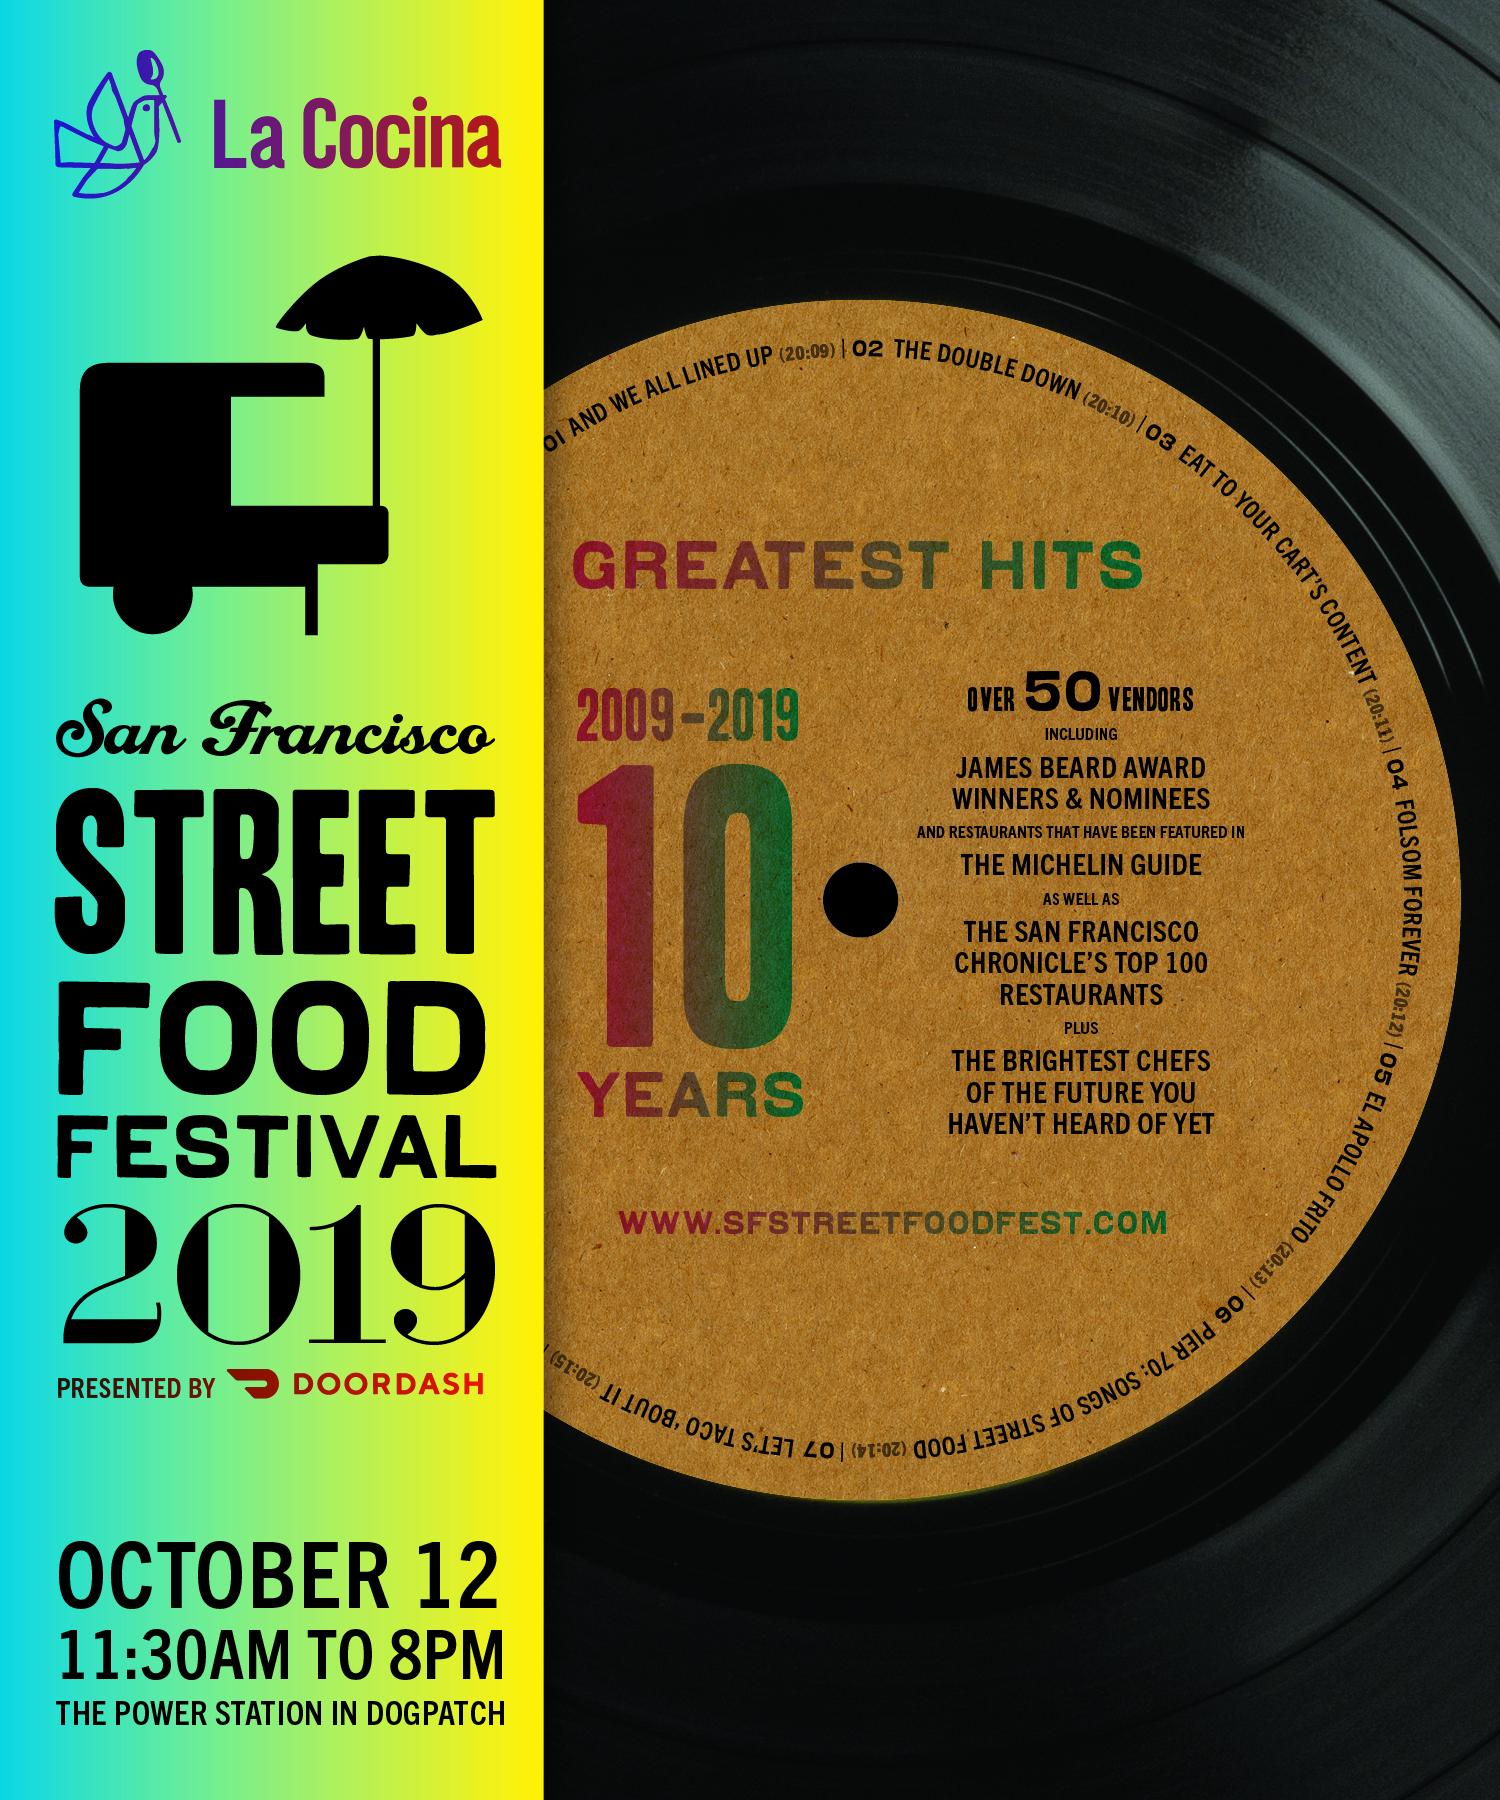 LaCocina - SF Street Food Festival - Alice Chau.jpg